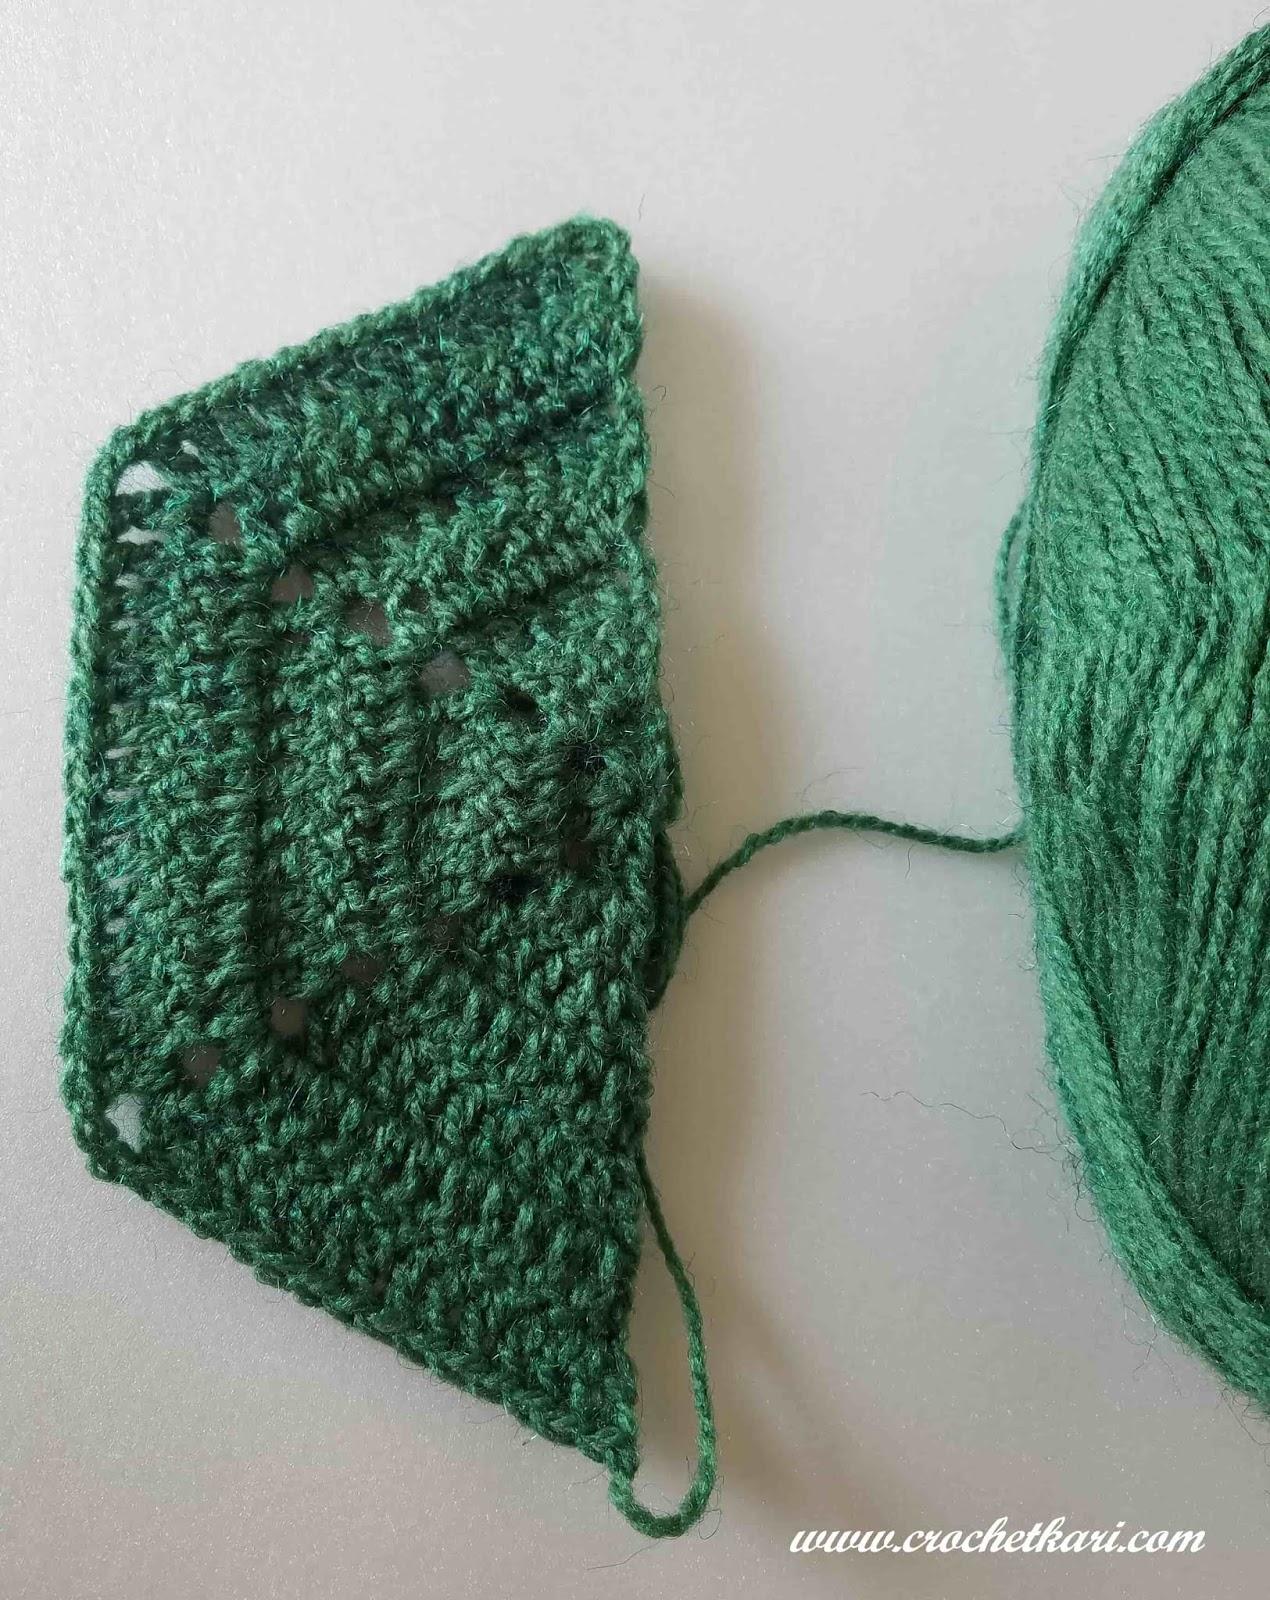 Crochetkari Crochet Hexagon Blanket Half Hexagon Pattern And Joining